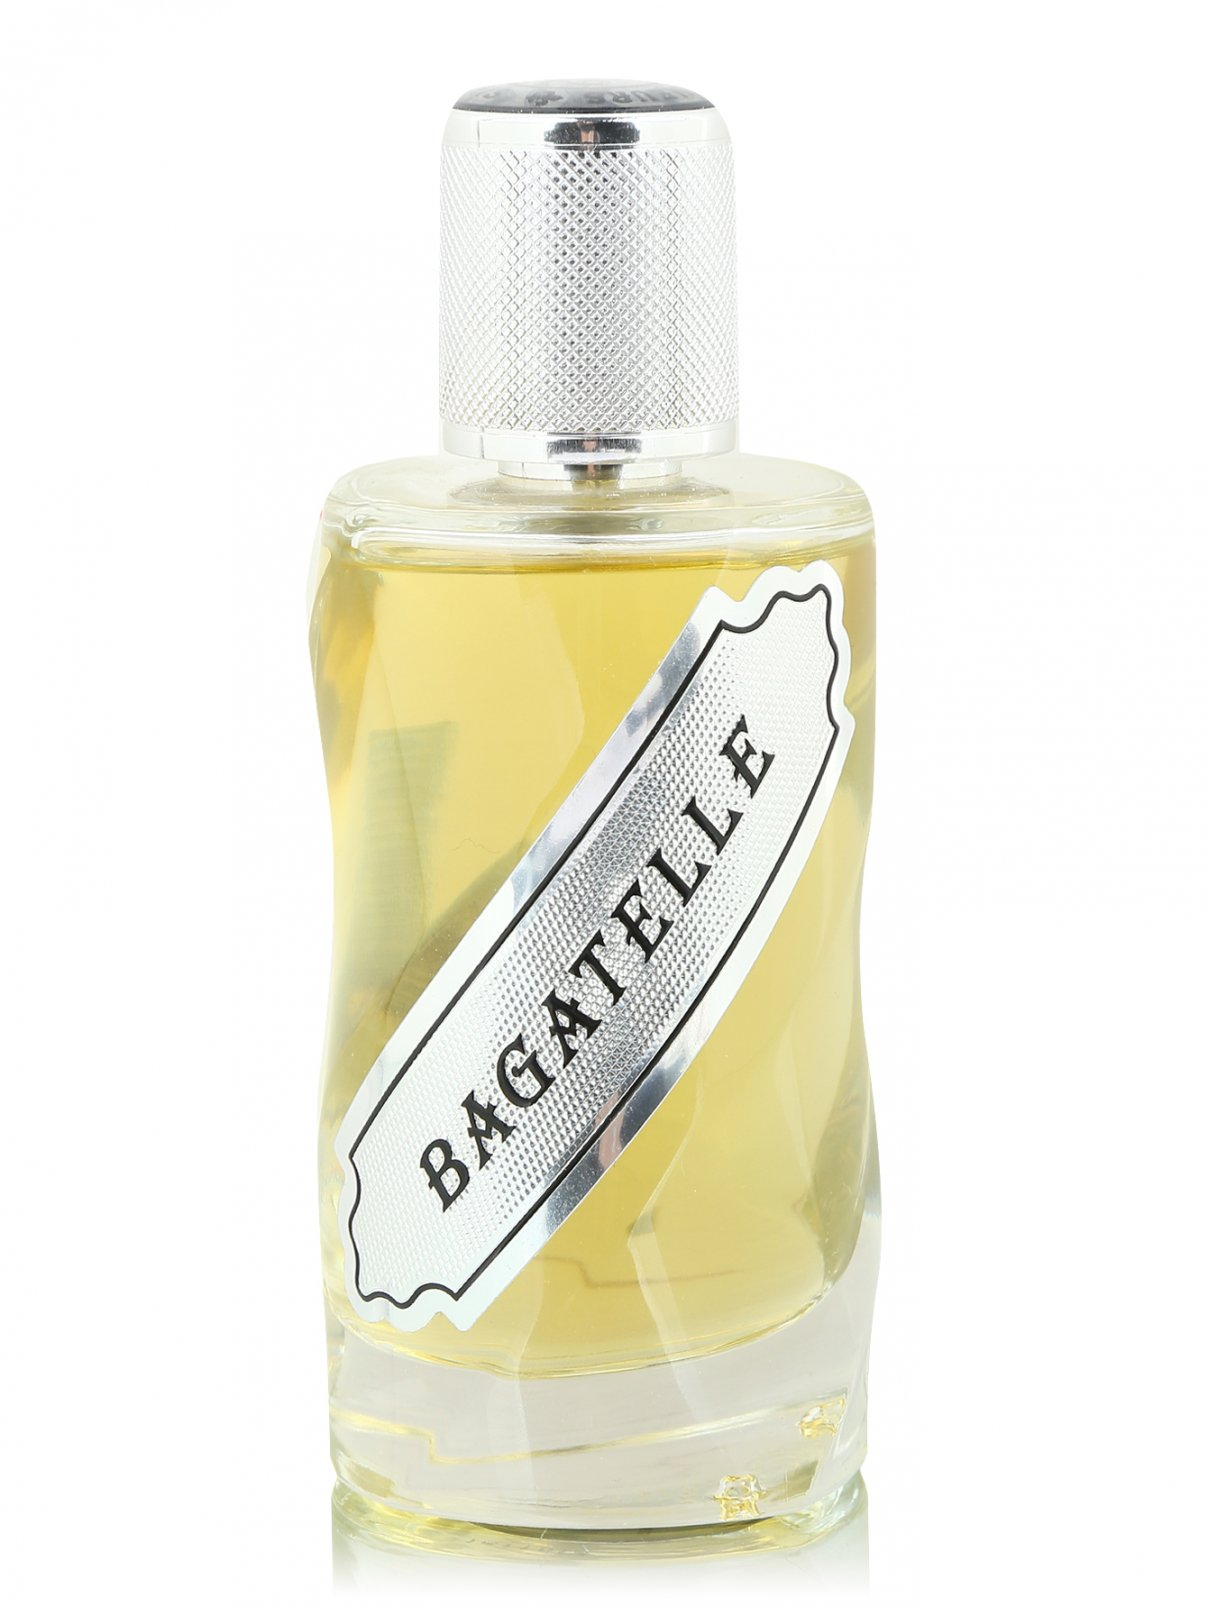 Парфюмерная вода 100 мл  BAGATELLE Royal Jardins 12 Parfumeurs Francais  –  Общий вид